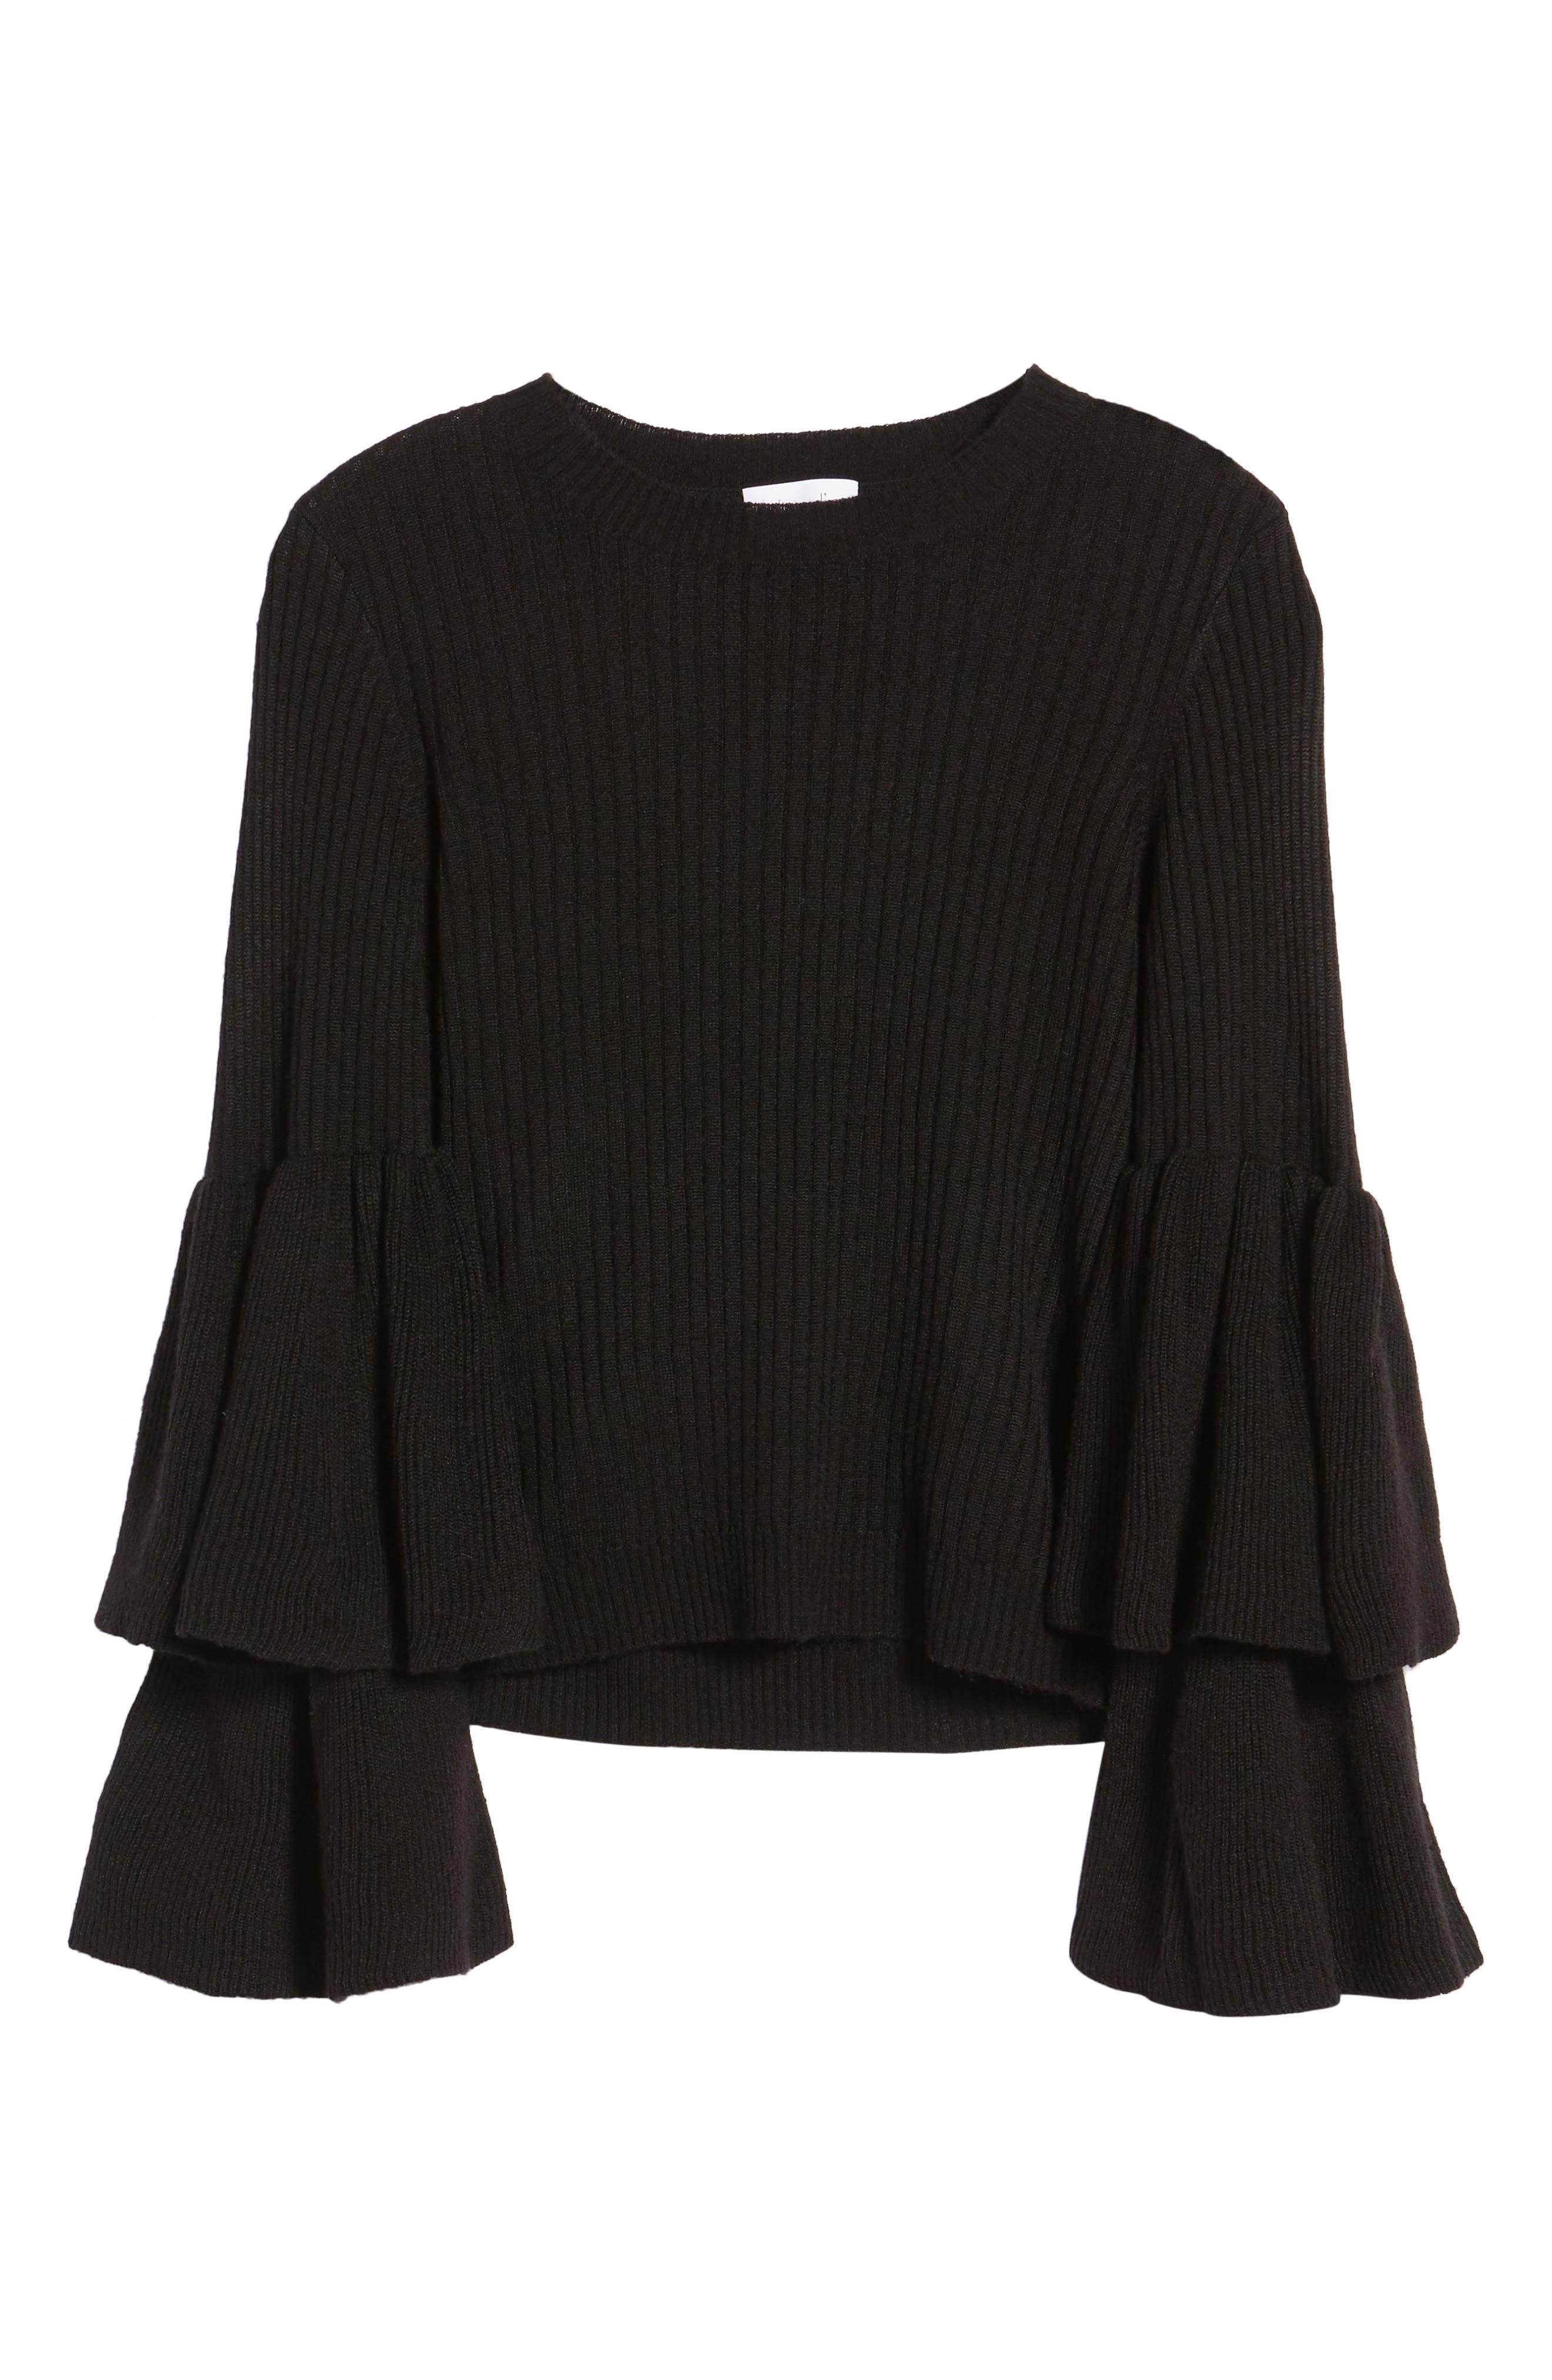 Tiara Bell Sleeve Sweater,                             Alternate thumbnail 6, color,                             001